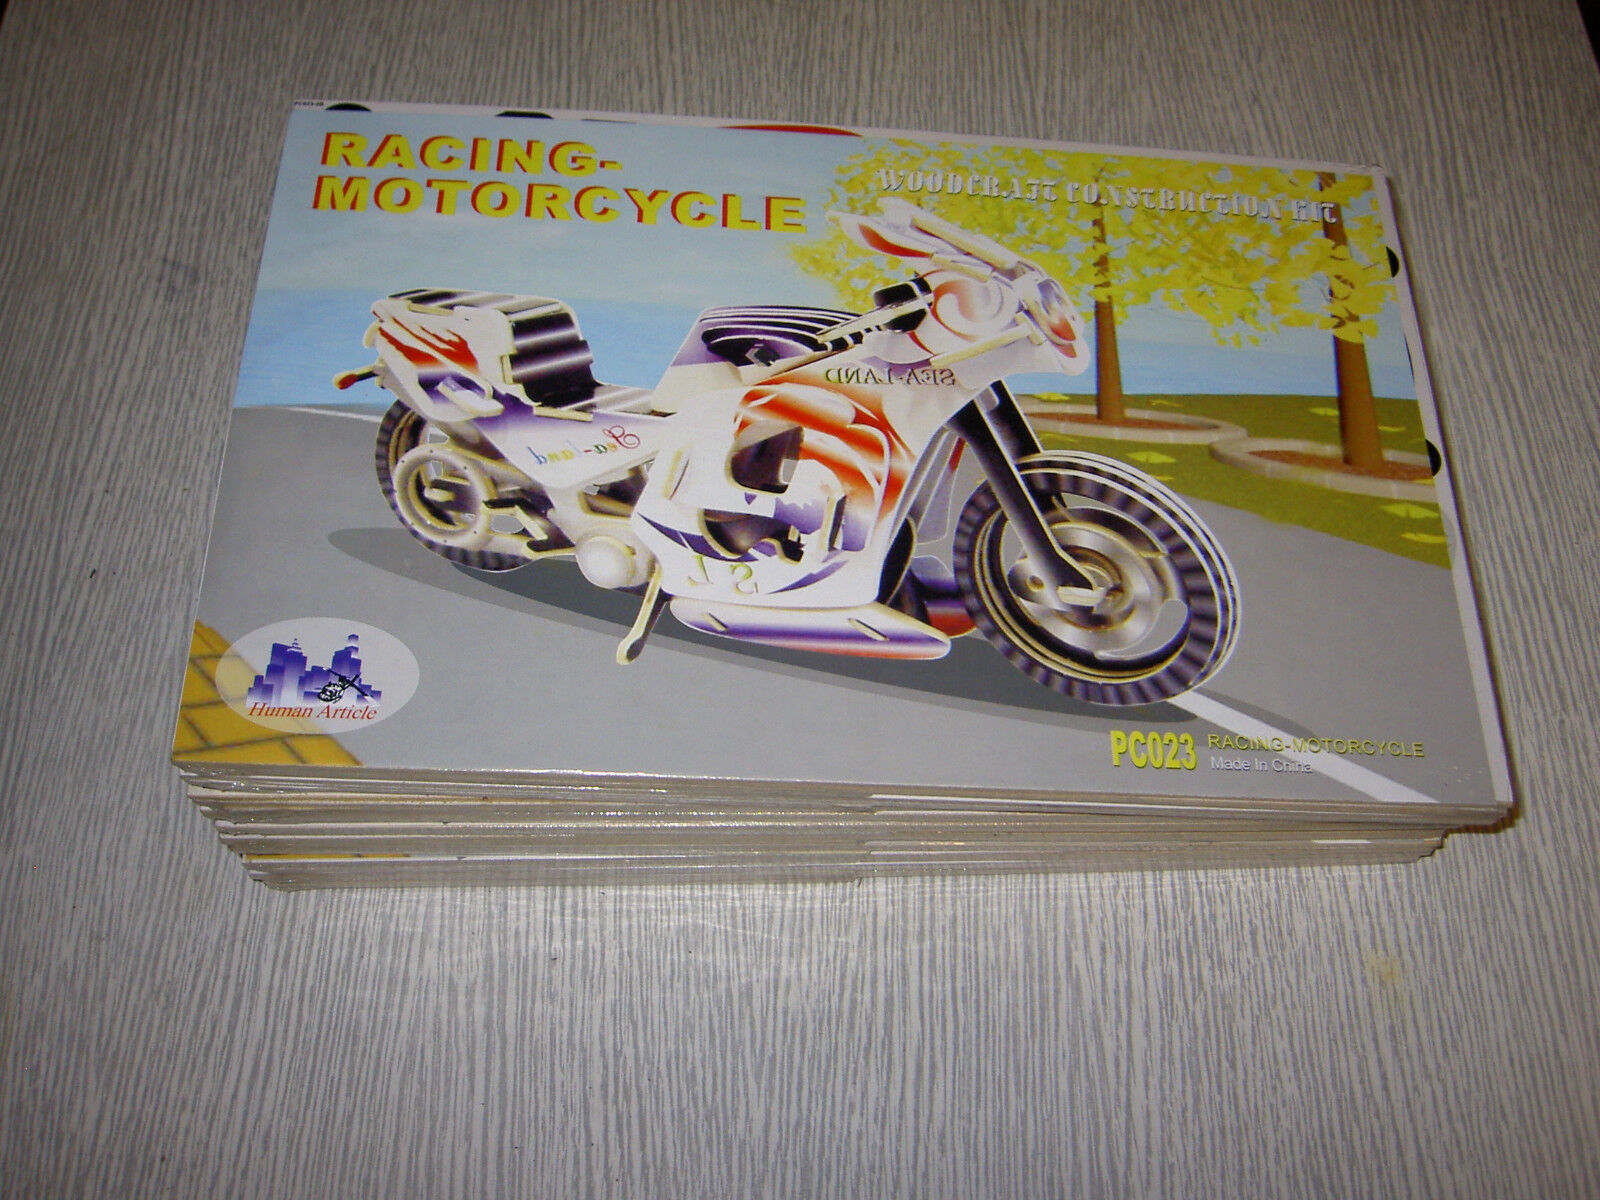 IDEAL RETAILER BUNDLE OF 10 MOTORCYCLES RACE